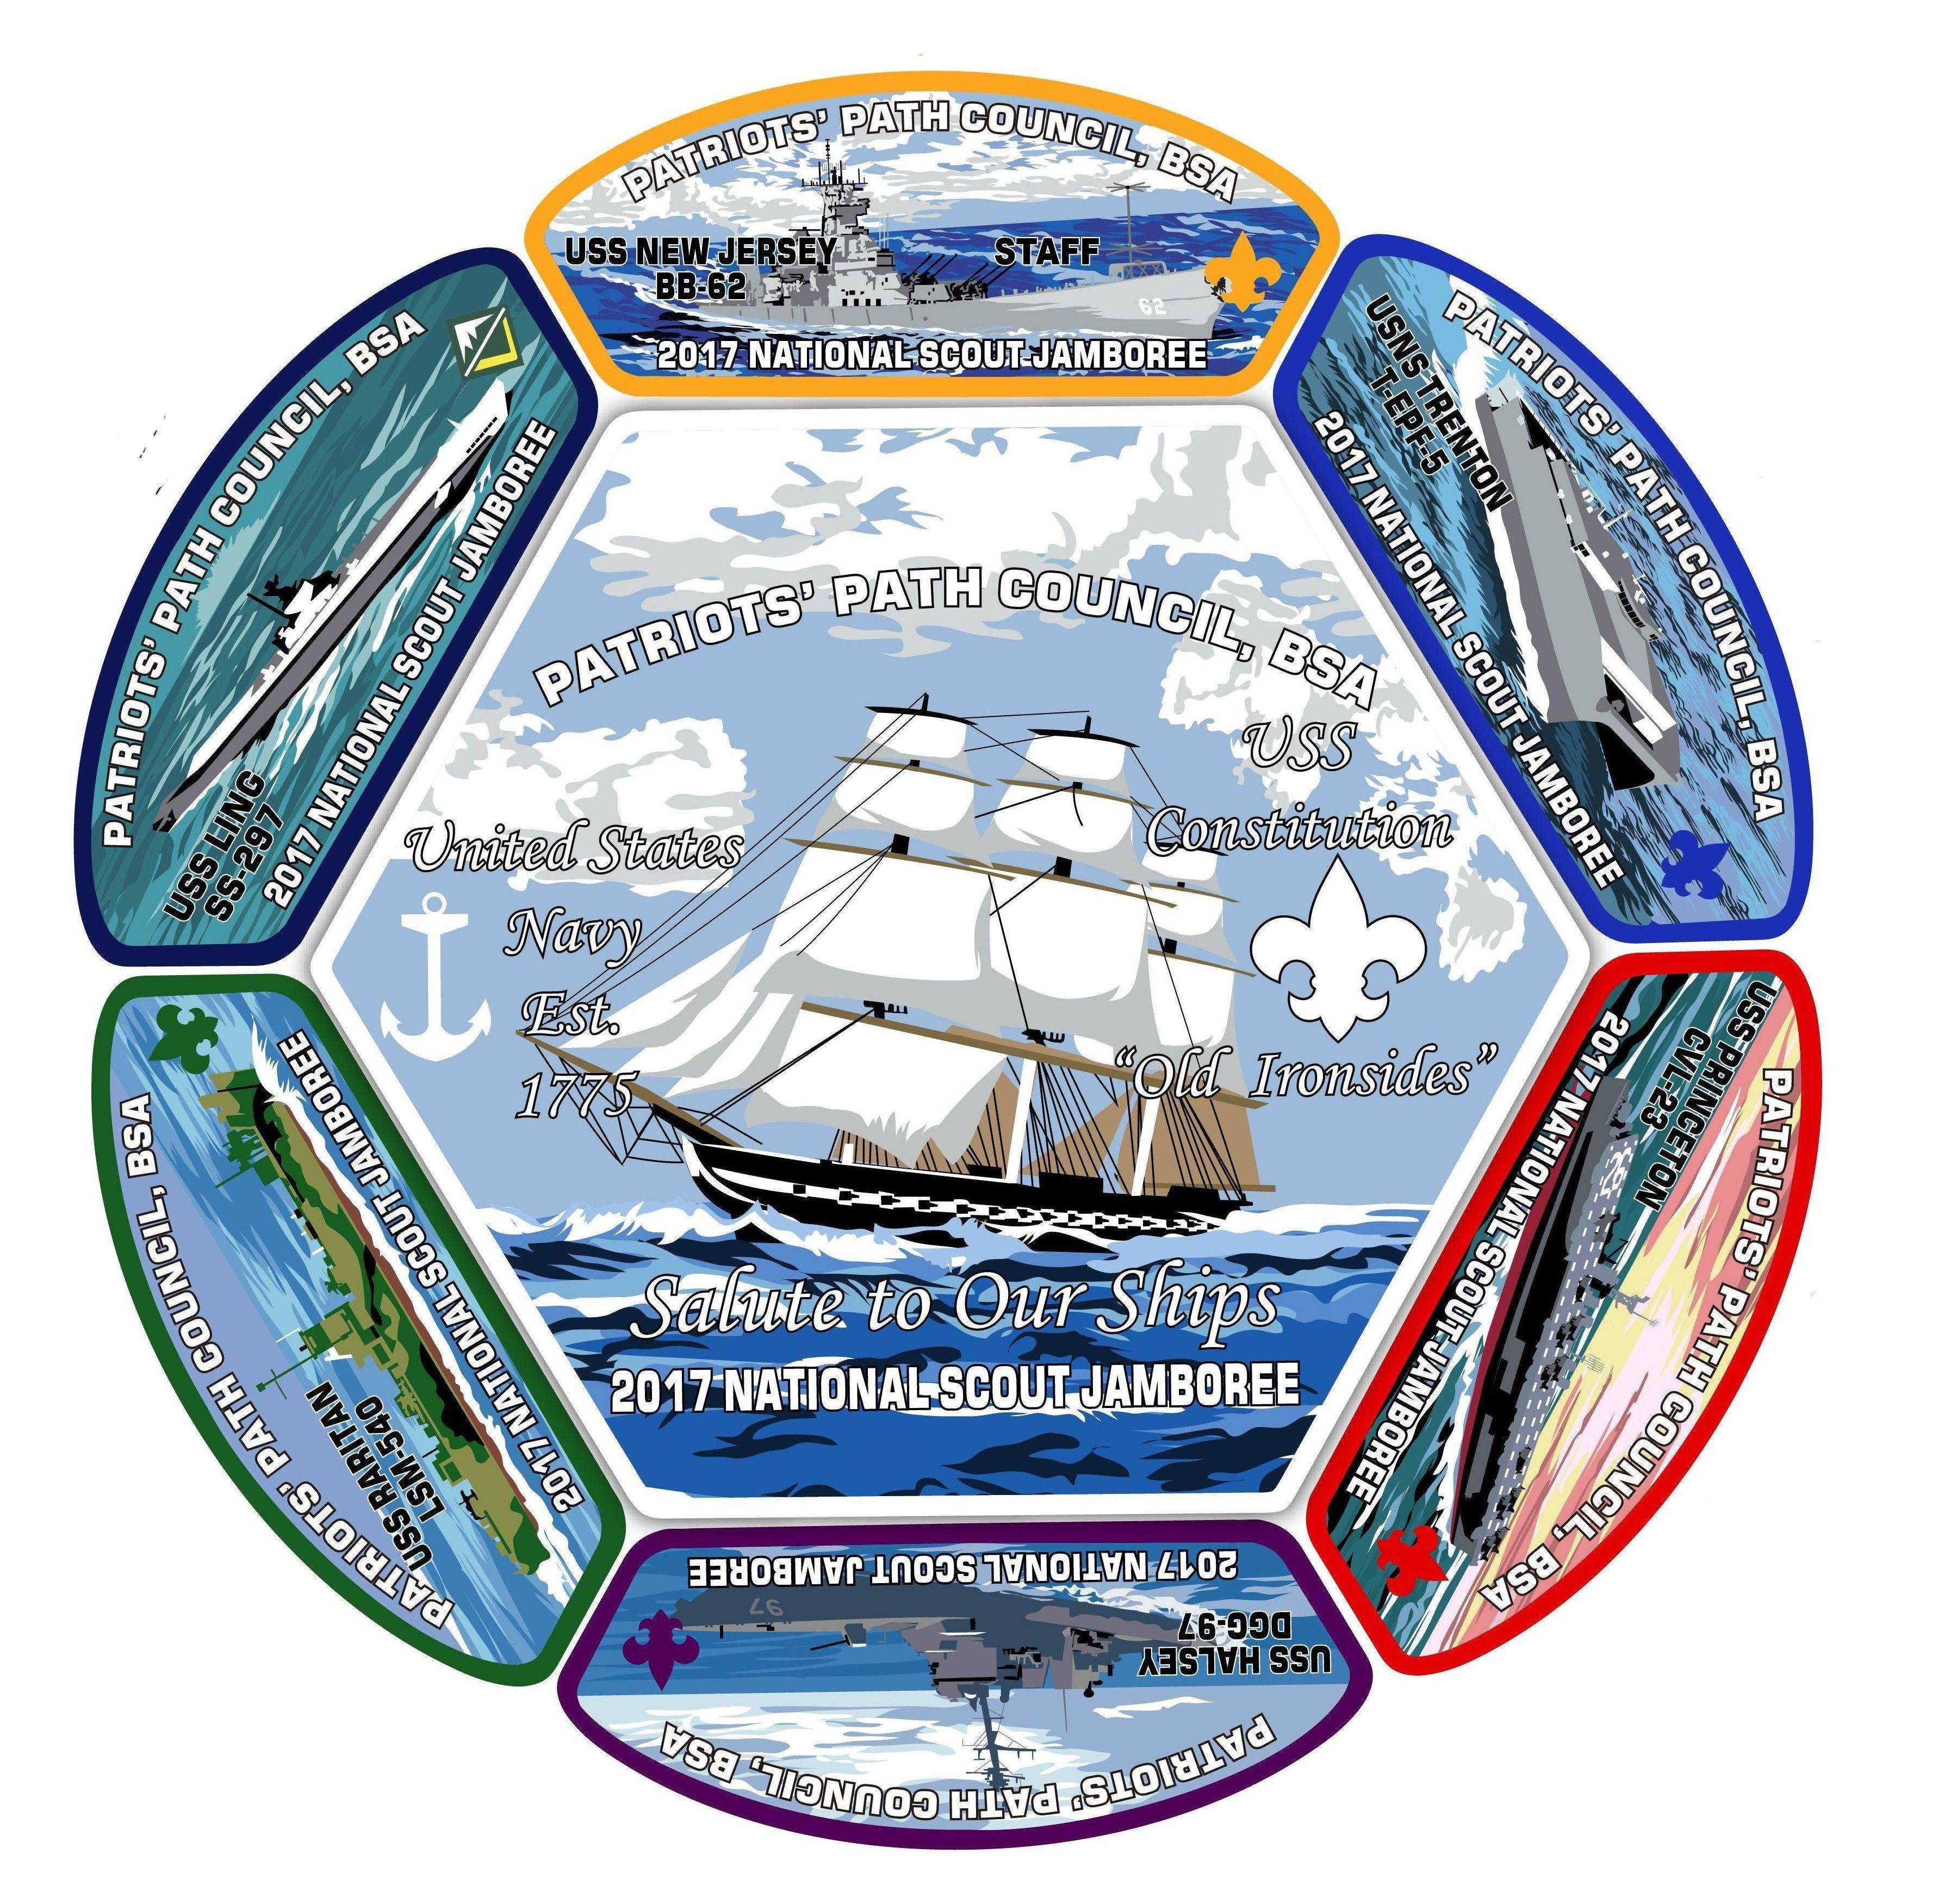 Boy Scouts' 2017 Jamboree Patch Will Honor 7 New Jersey Battleships